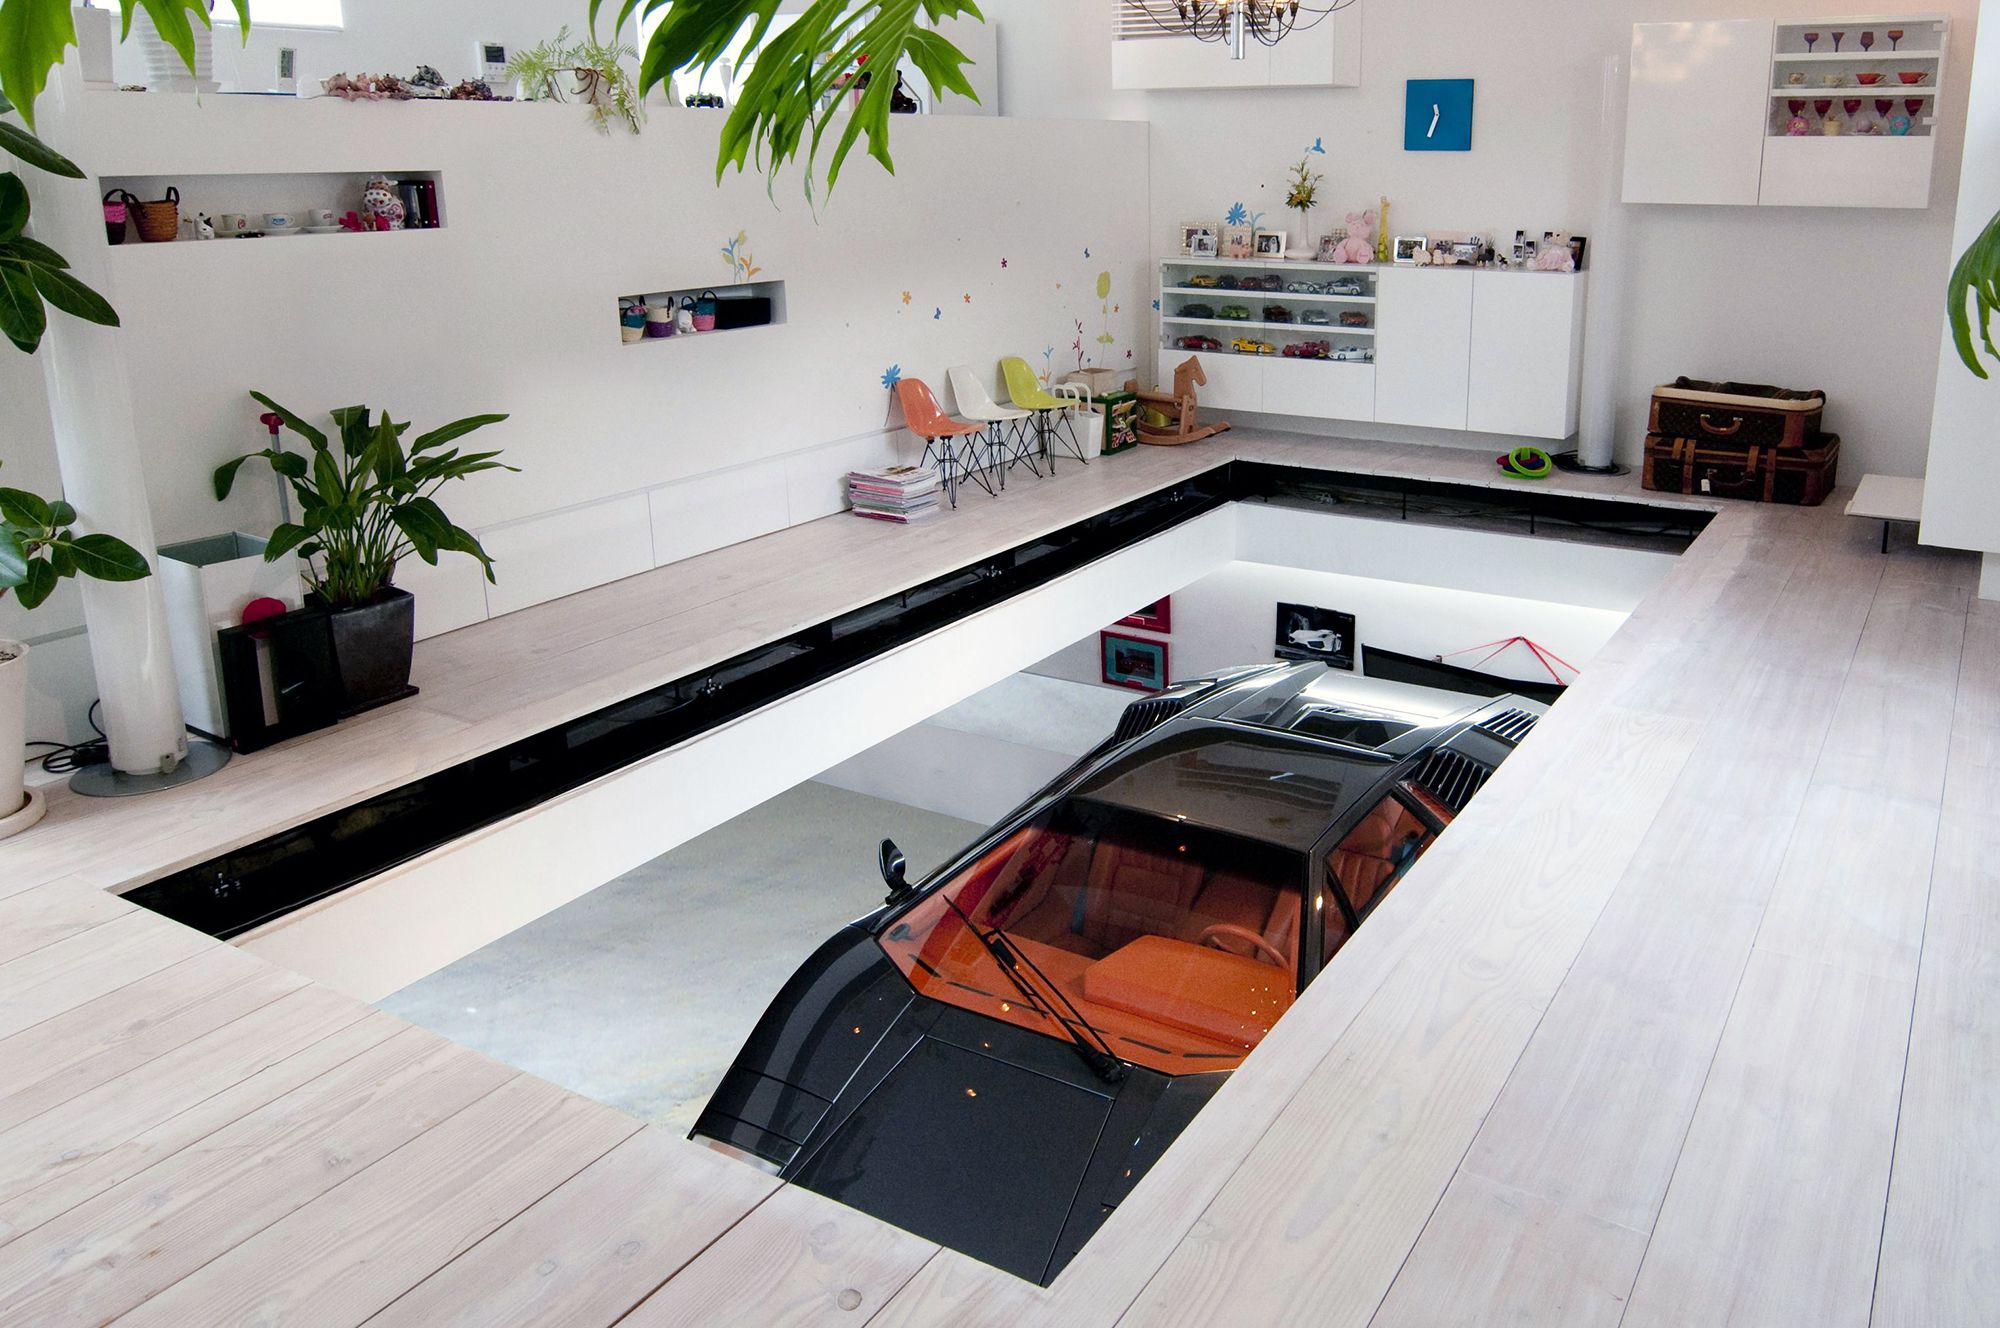 kre the house floating room by no 555 tsuchida takuya caandesign 013 3 living lift up the car jpg